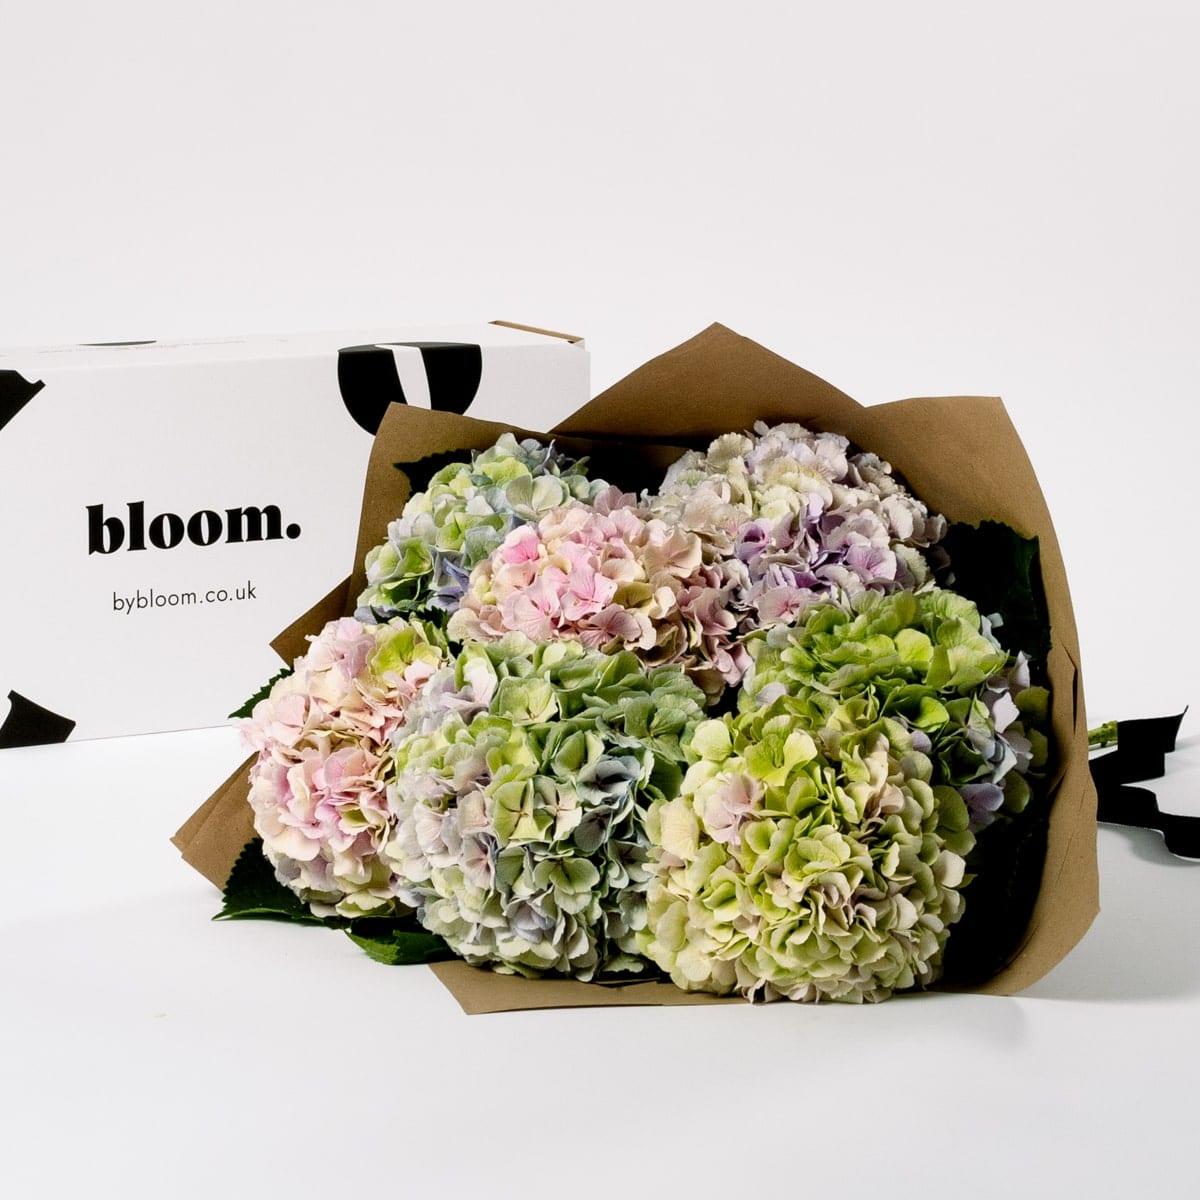 Bloom Flower Delivery   Pastel Mix Hydrangea